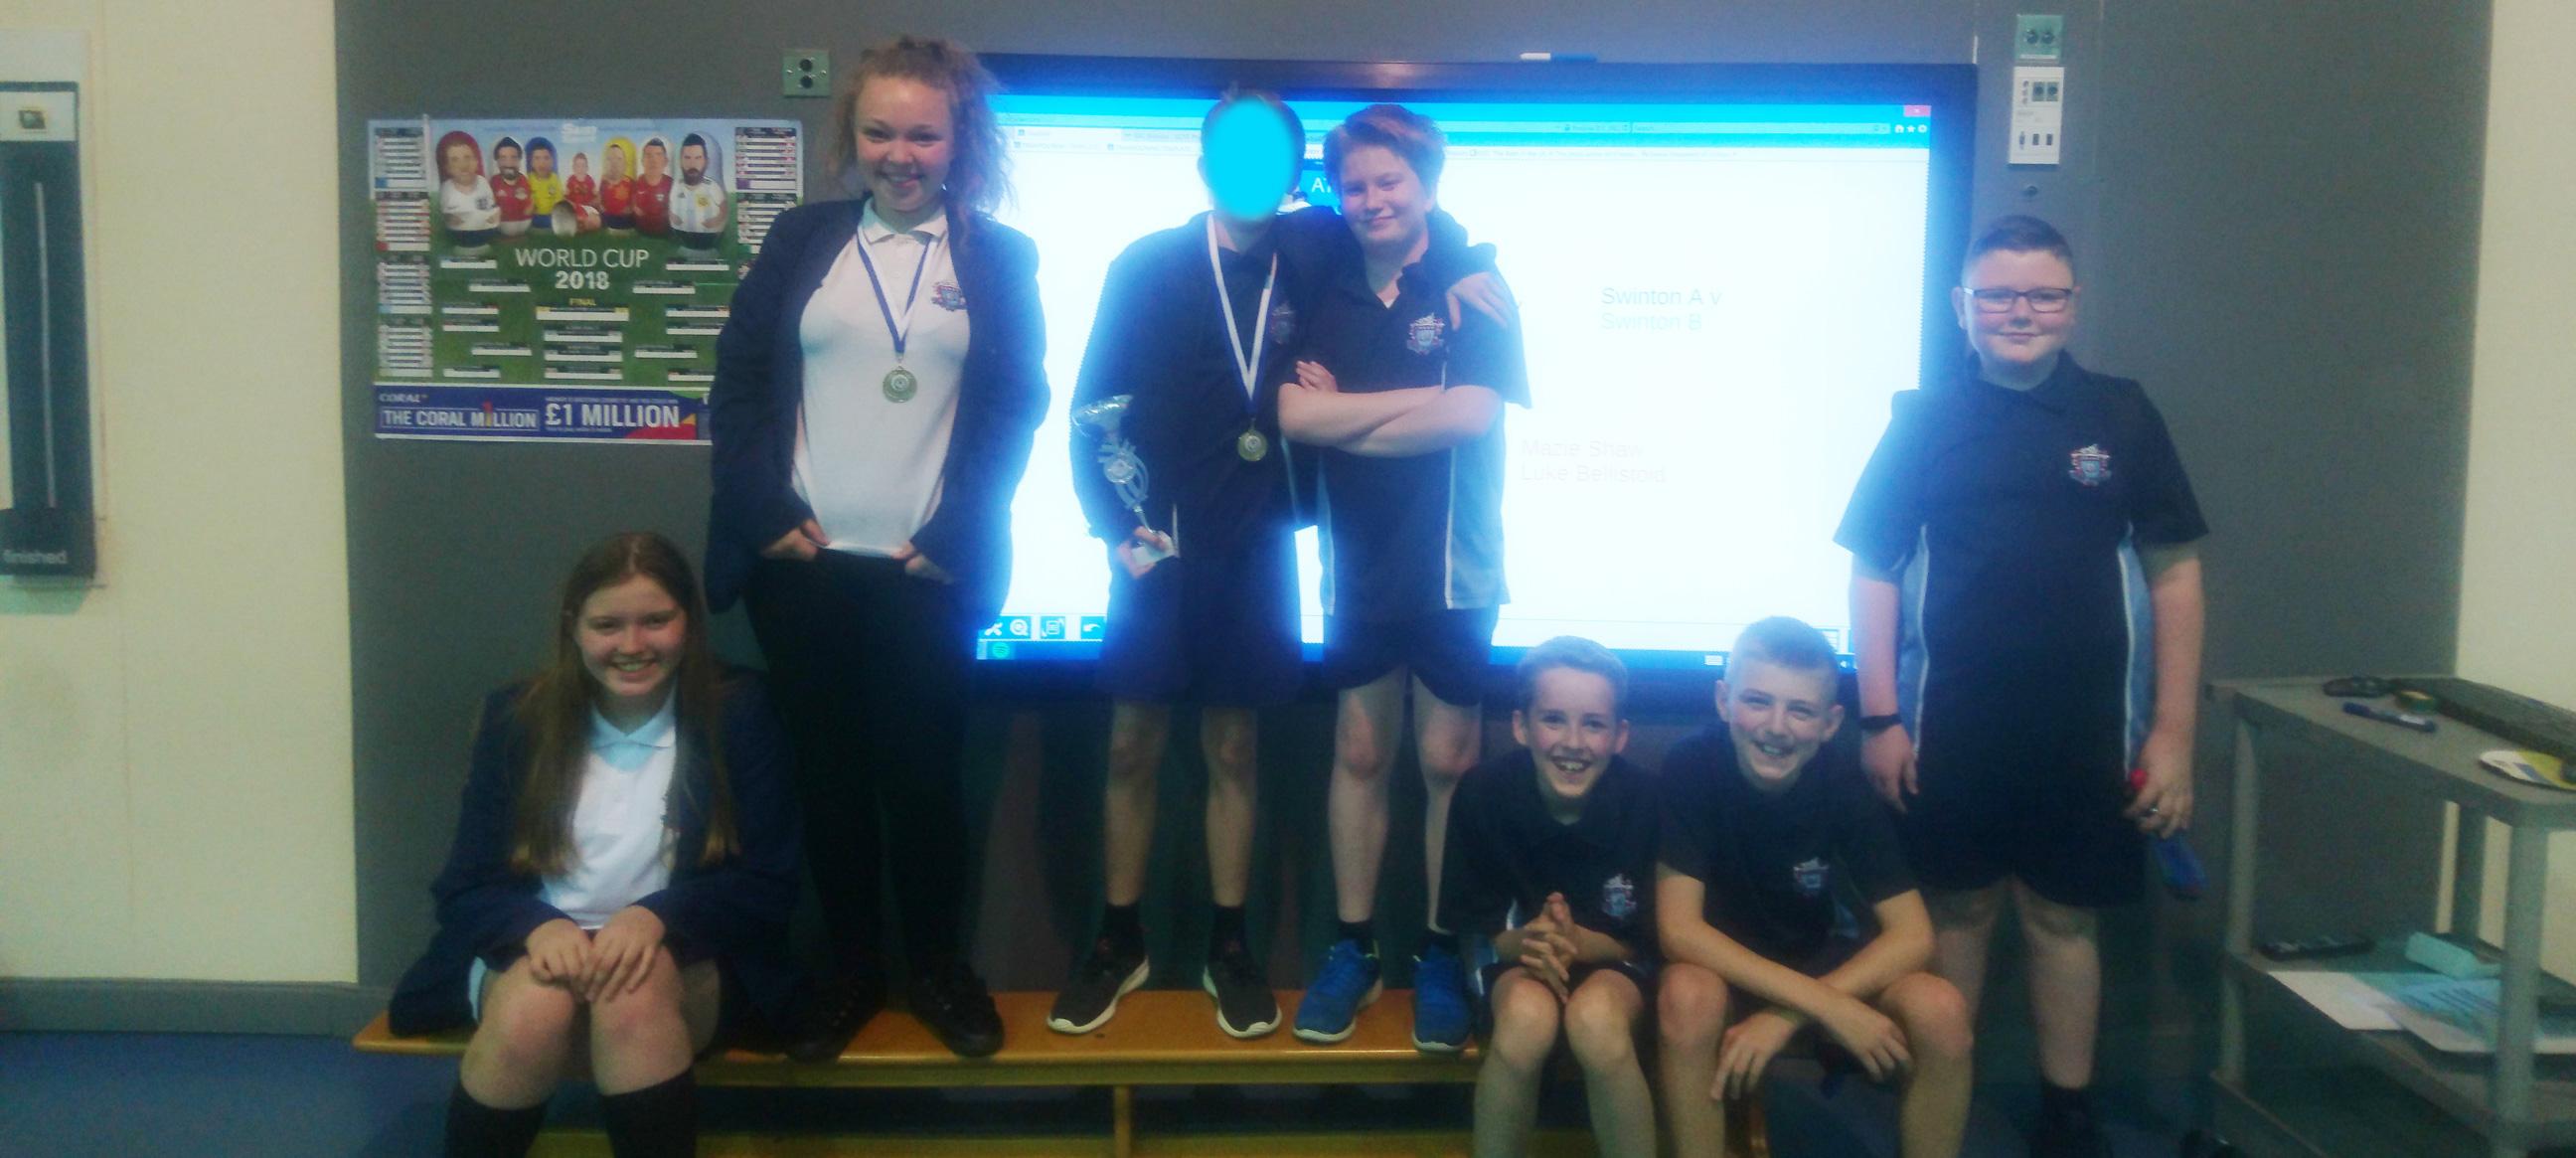 Salford Goal Ball Champions!